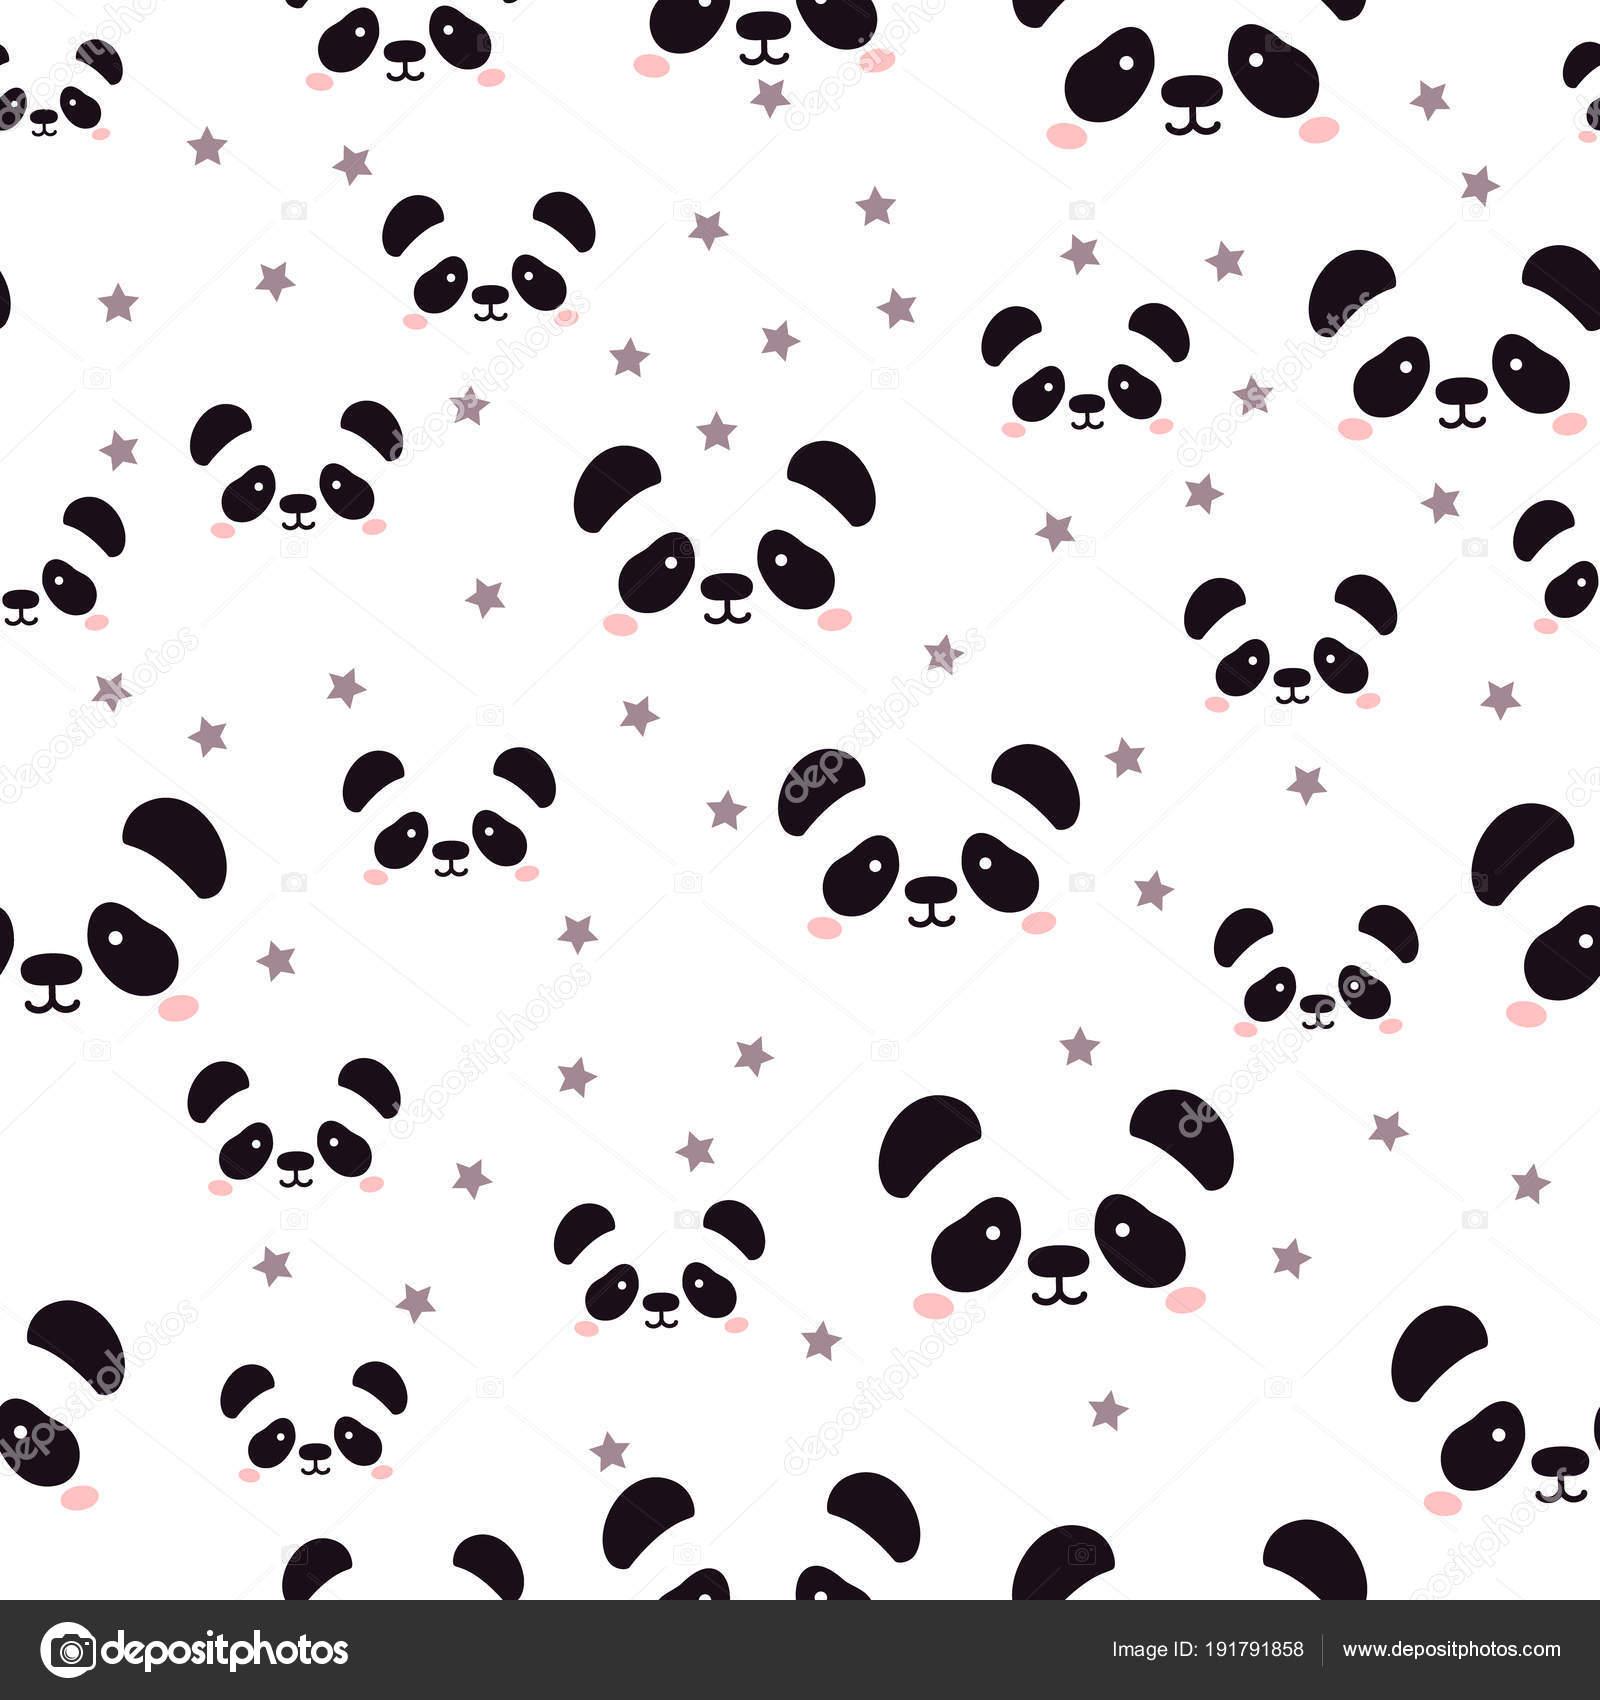 imágenes panda pantalla cara de panda lindo fondo de pantalla